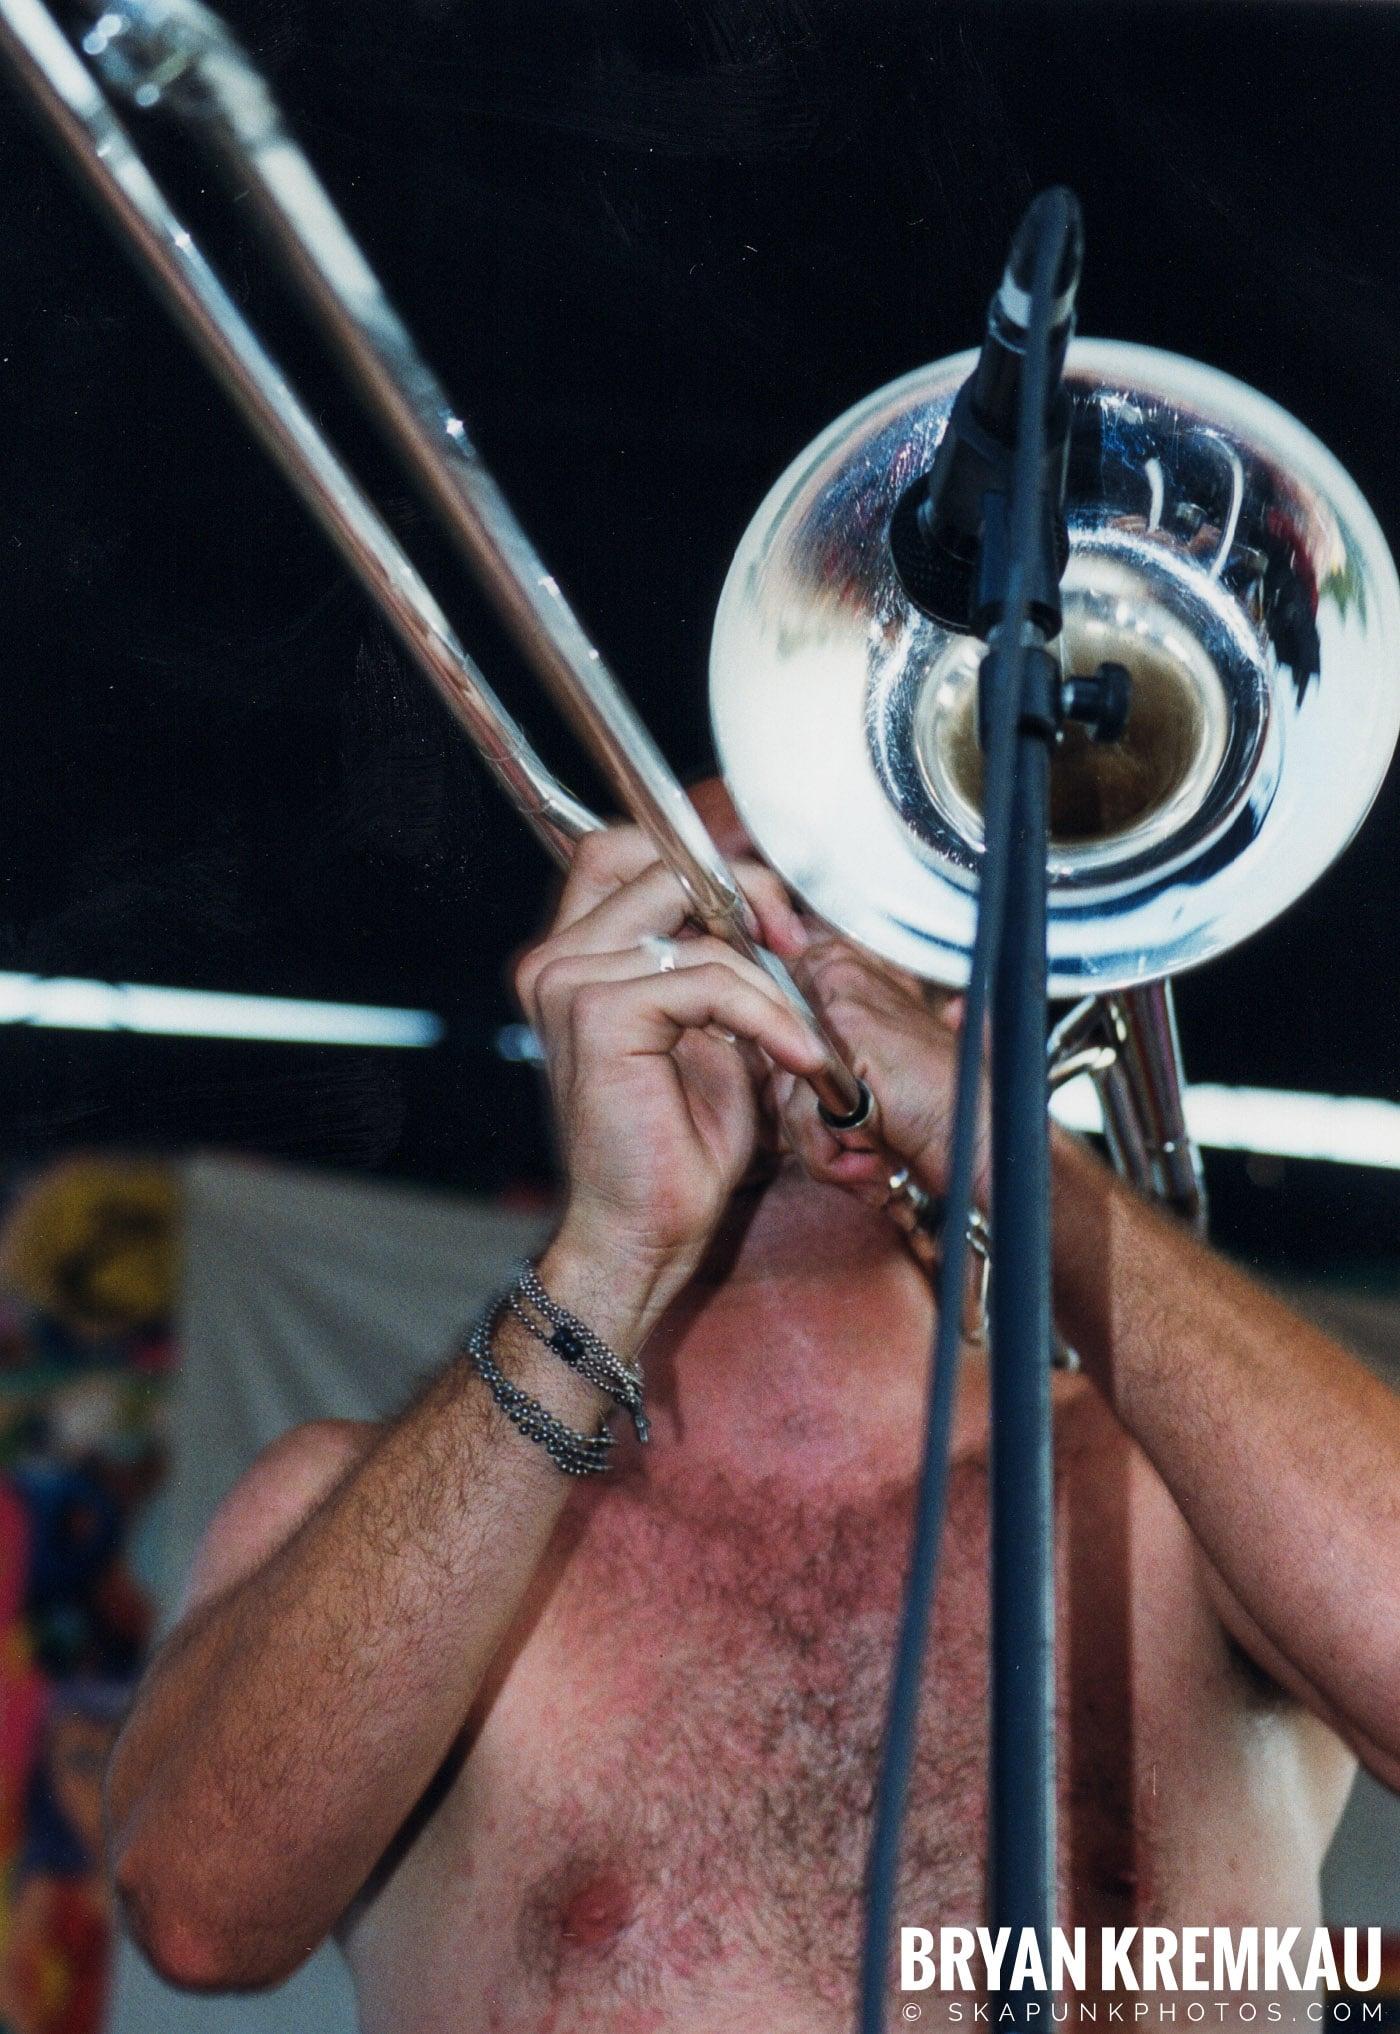 Less Than Jake @ Vans Warped Tour, Randall's Island, NYC - 7.16.99 (4)